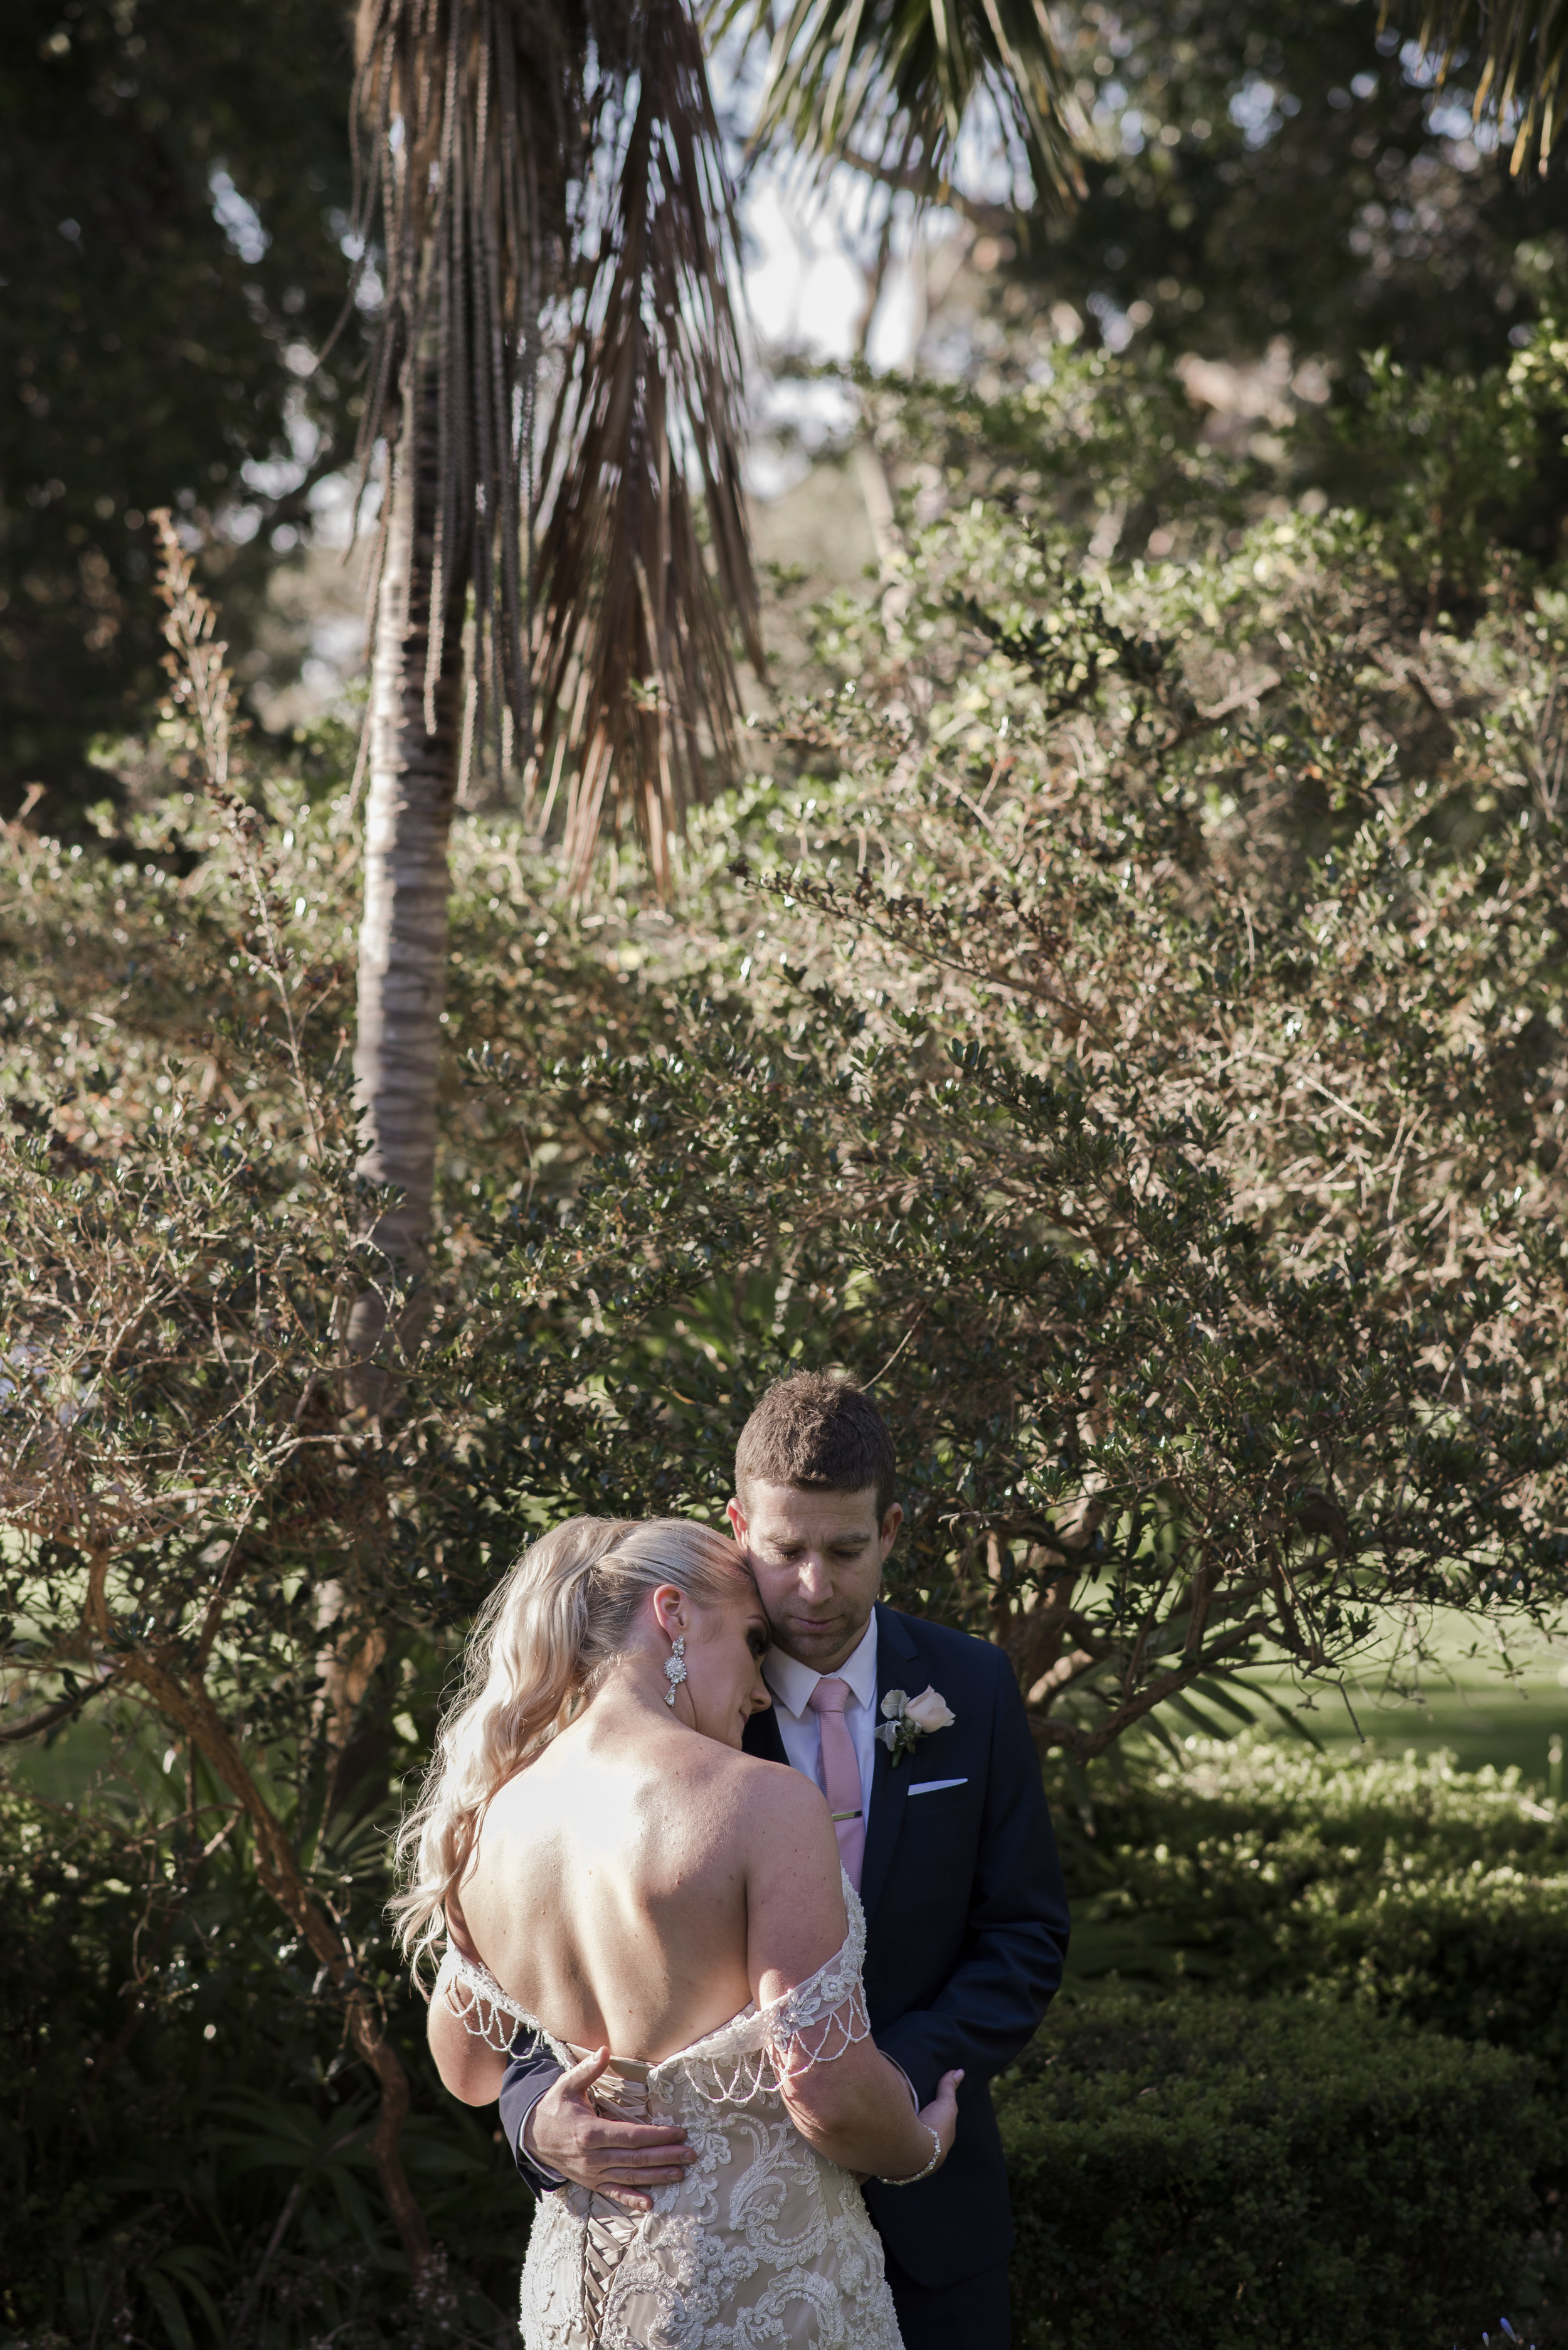 Teagan_Mayflower Weddings Photography_093.jpg